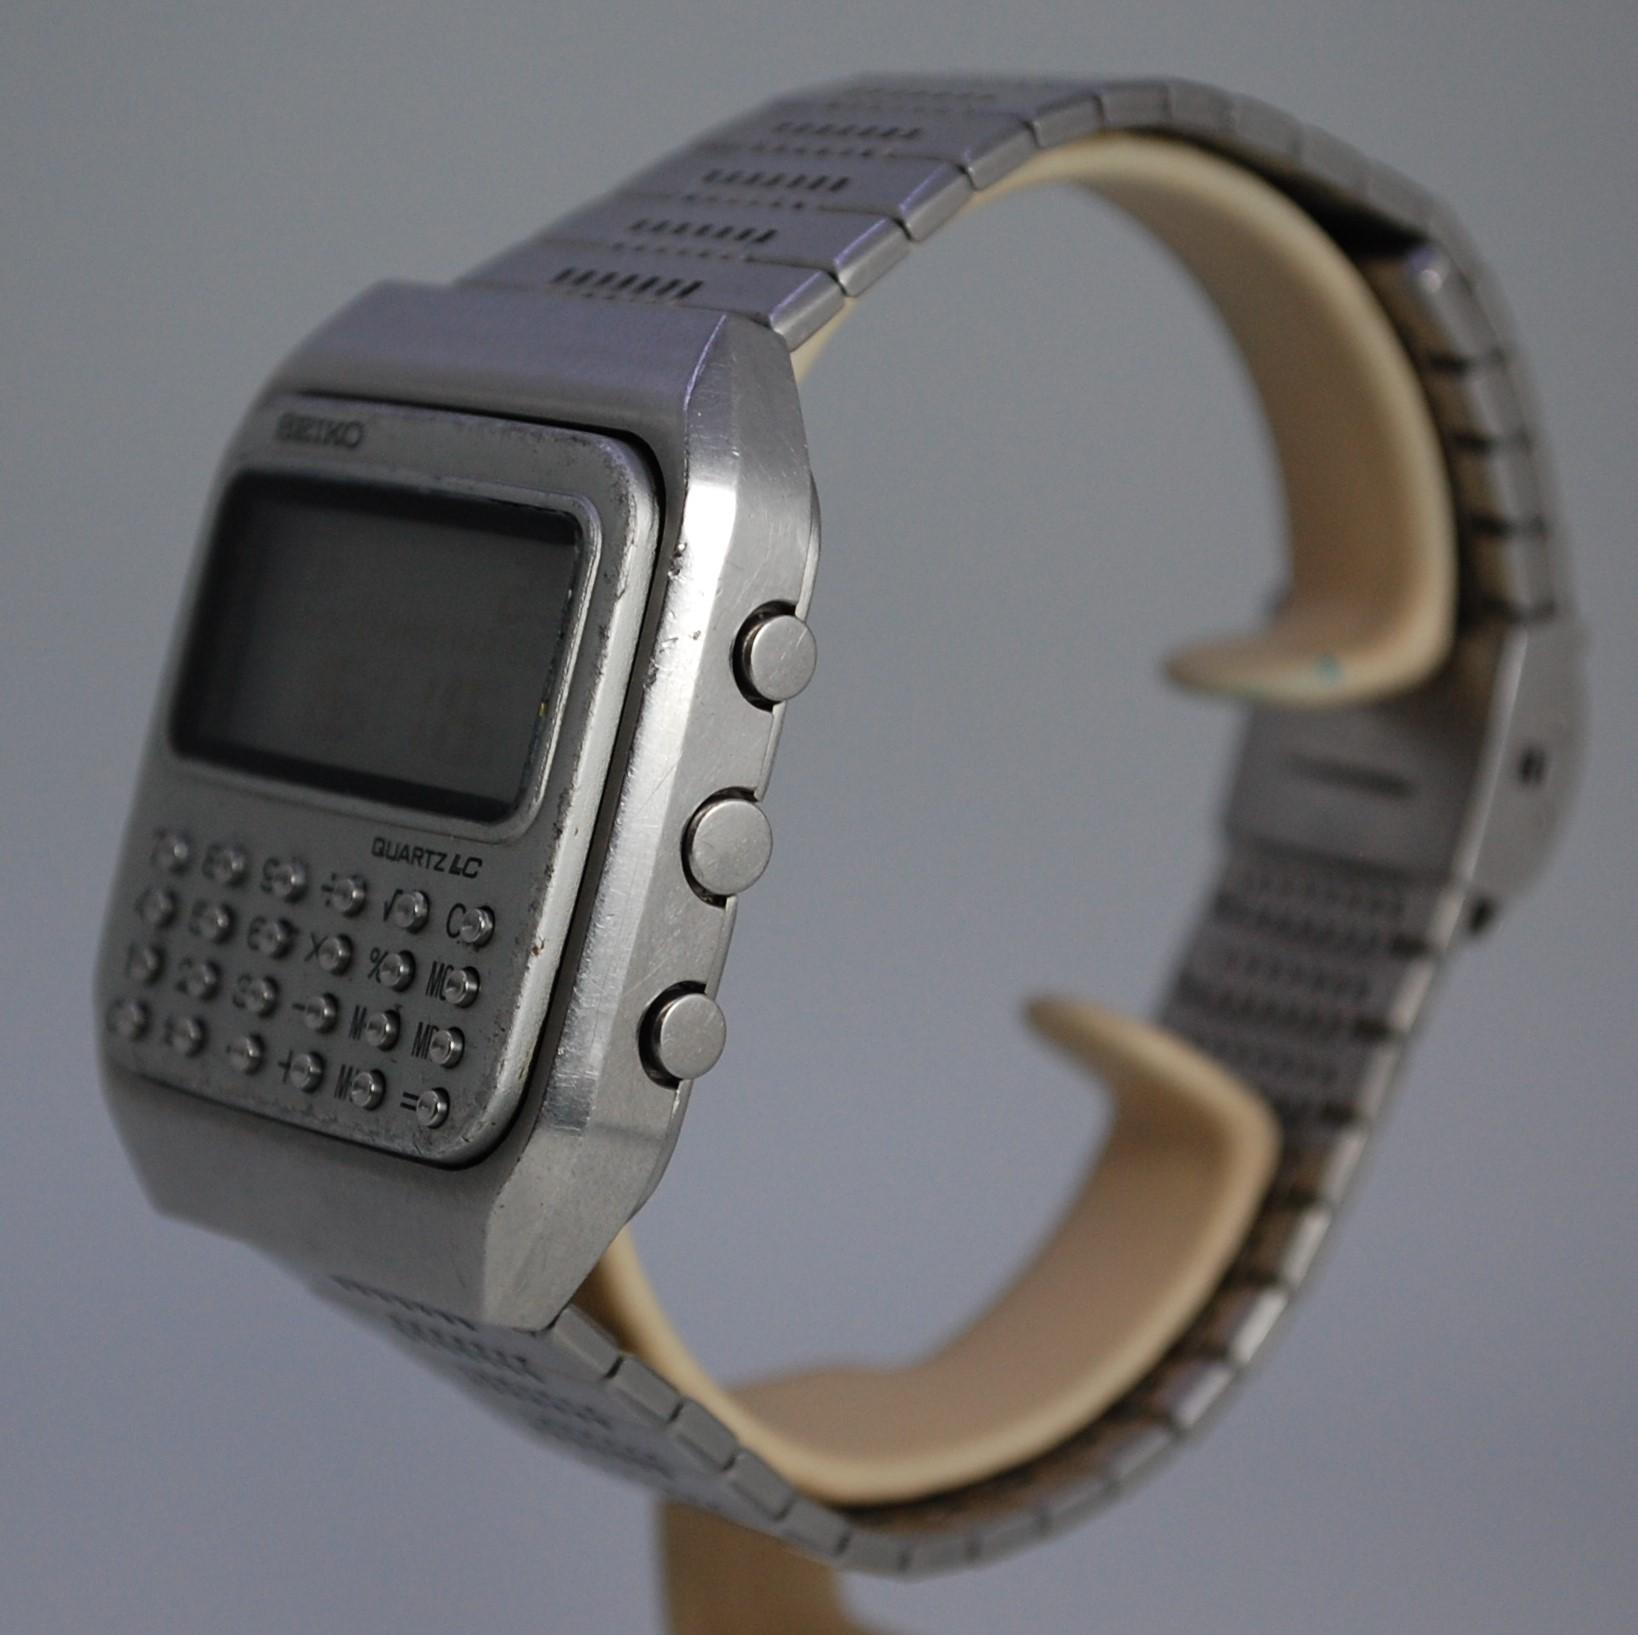 seiko digital calculator watch